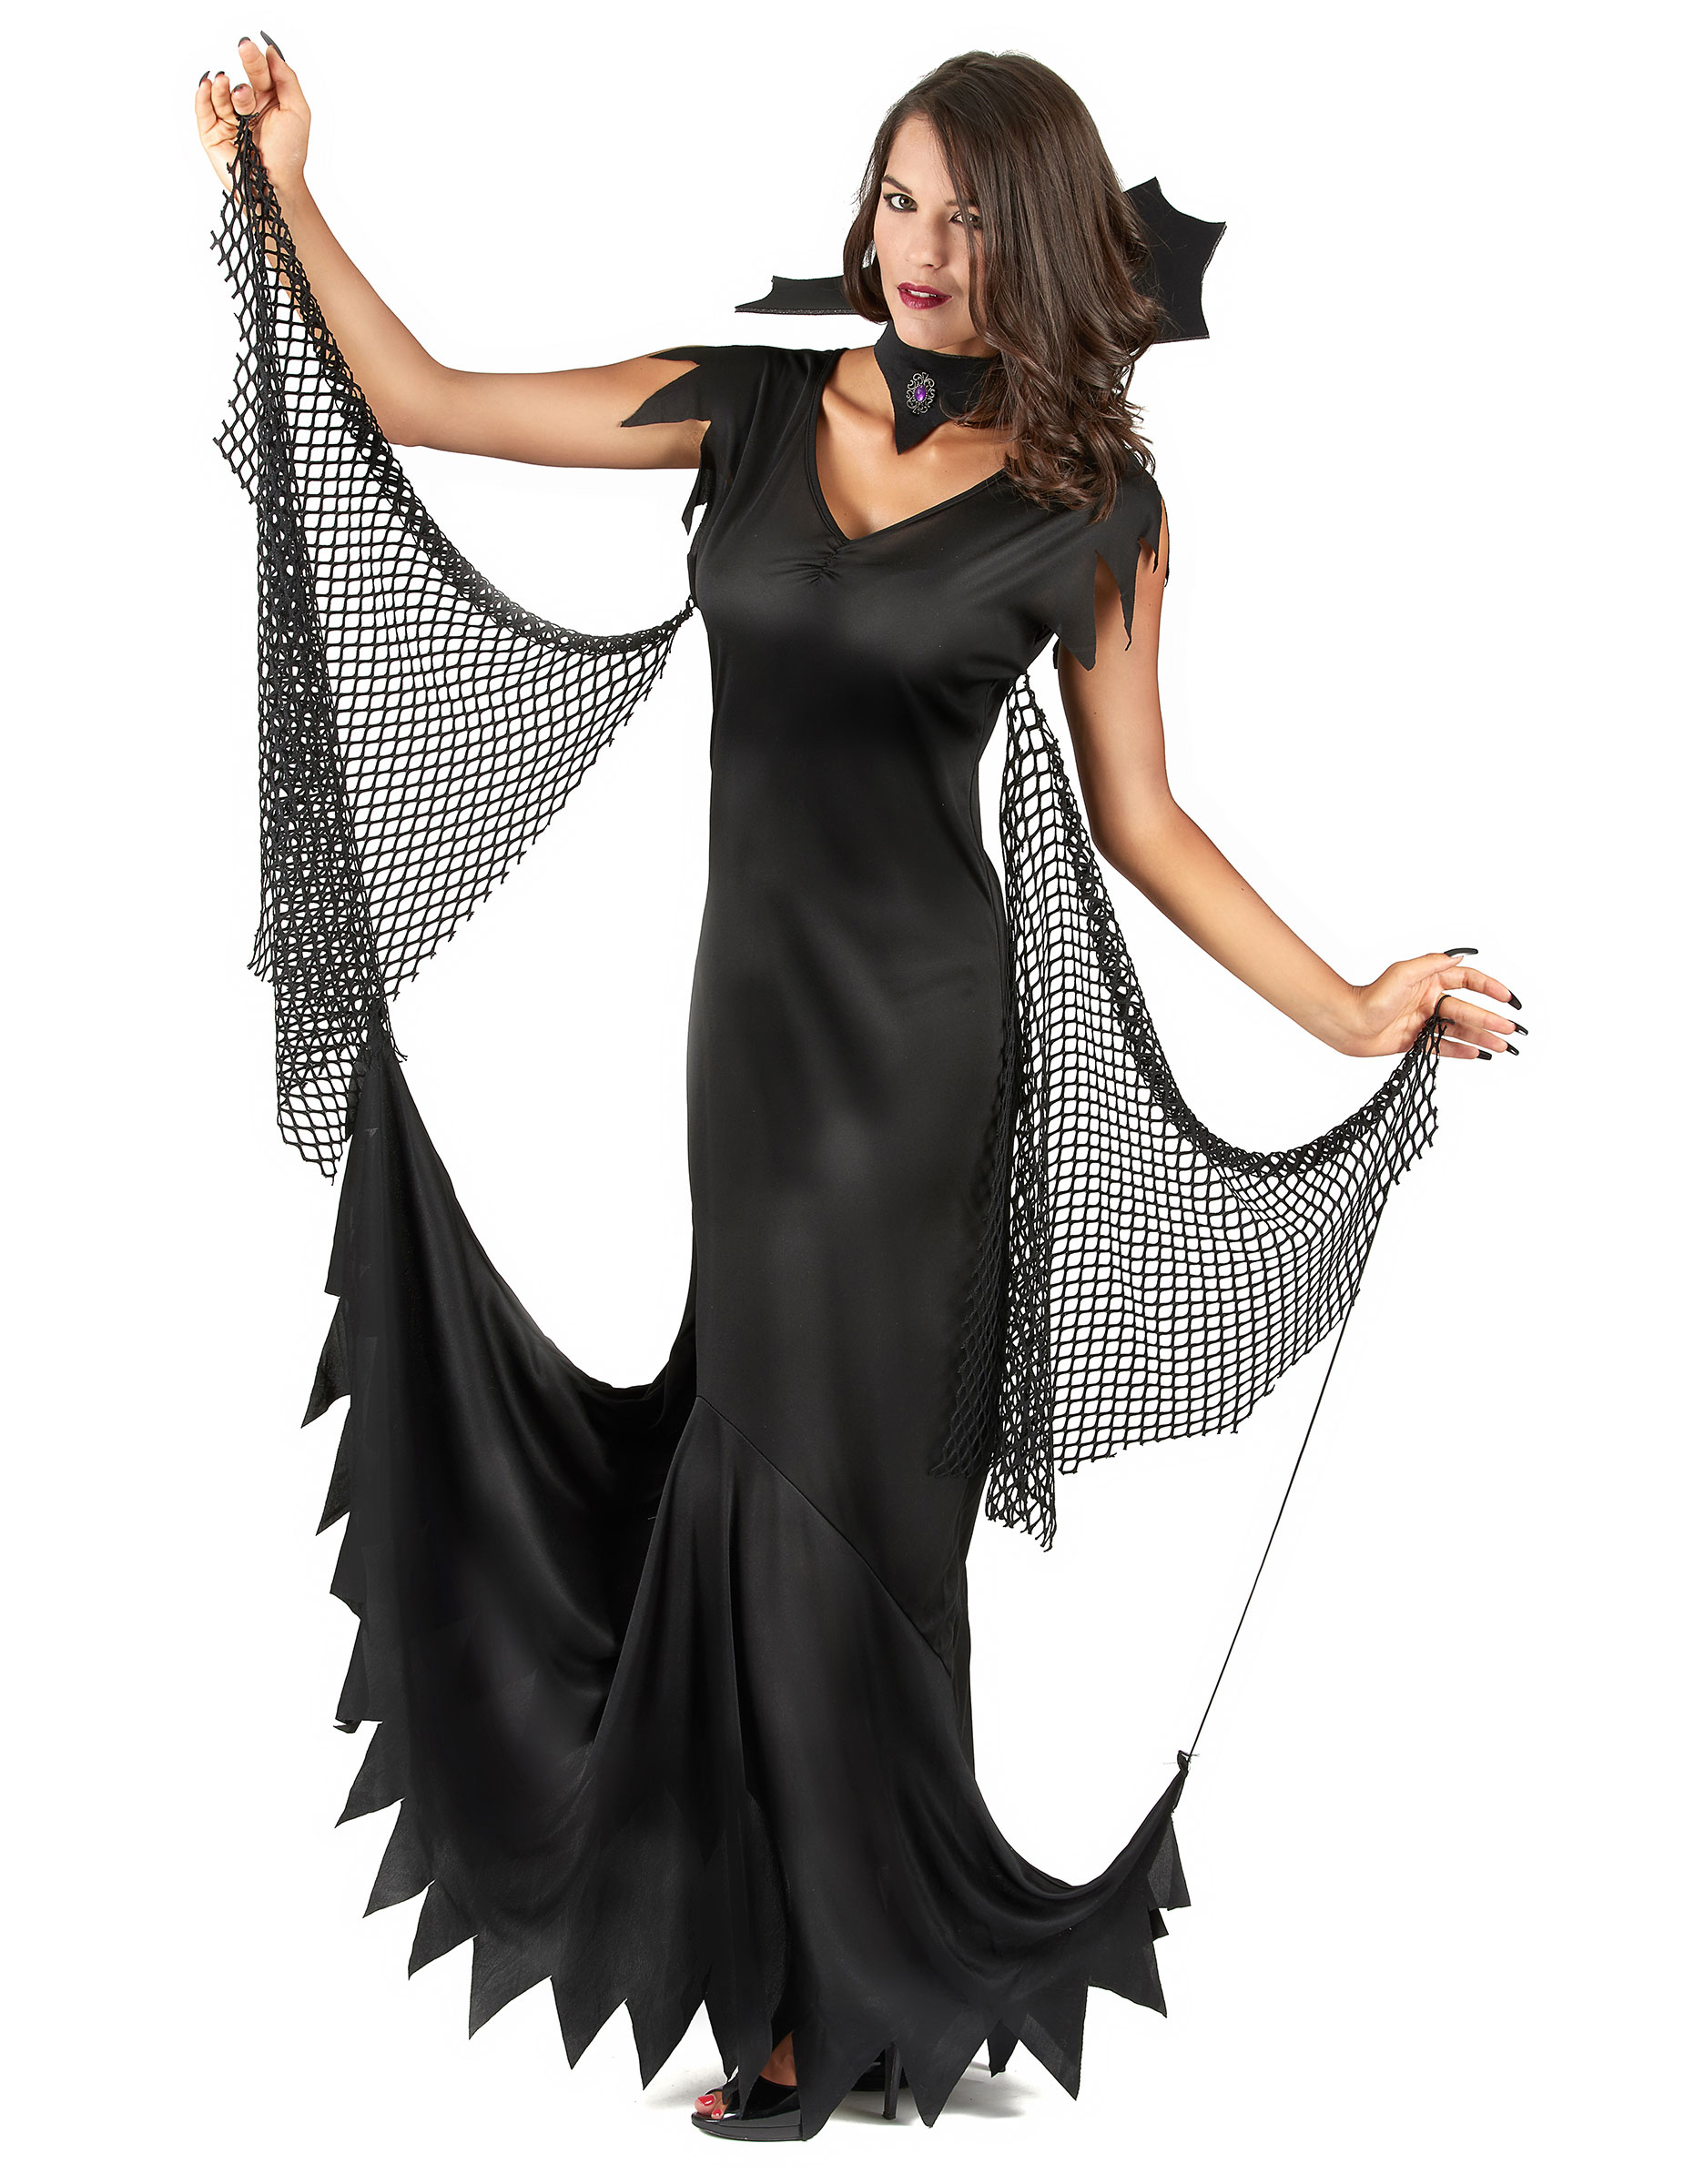 elegantes vampirkost m f r damen kost me f r erwachsene. Black Bedroom Furniture Sets. Home Design Ideas